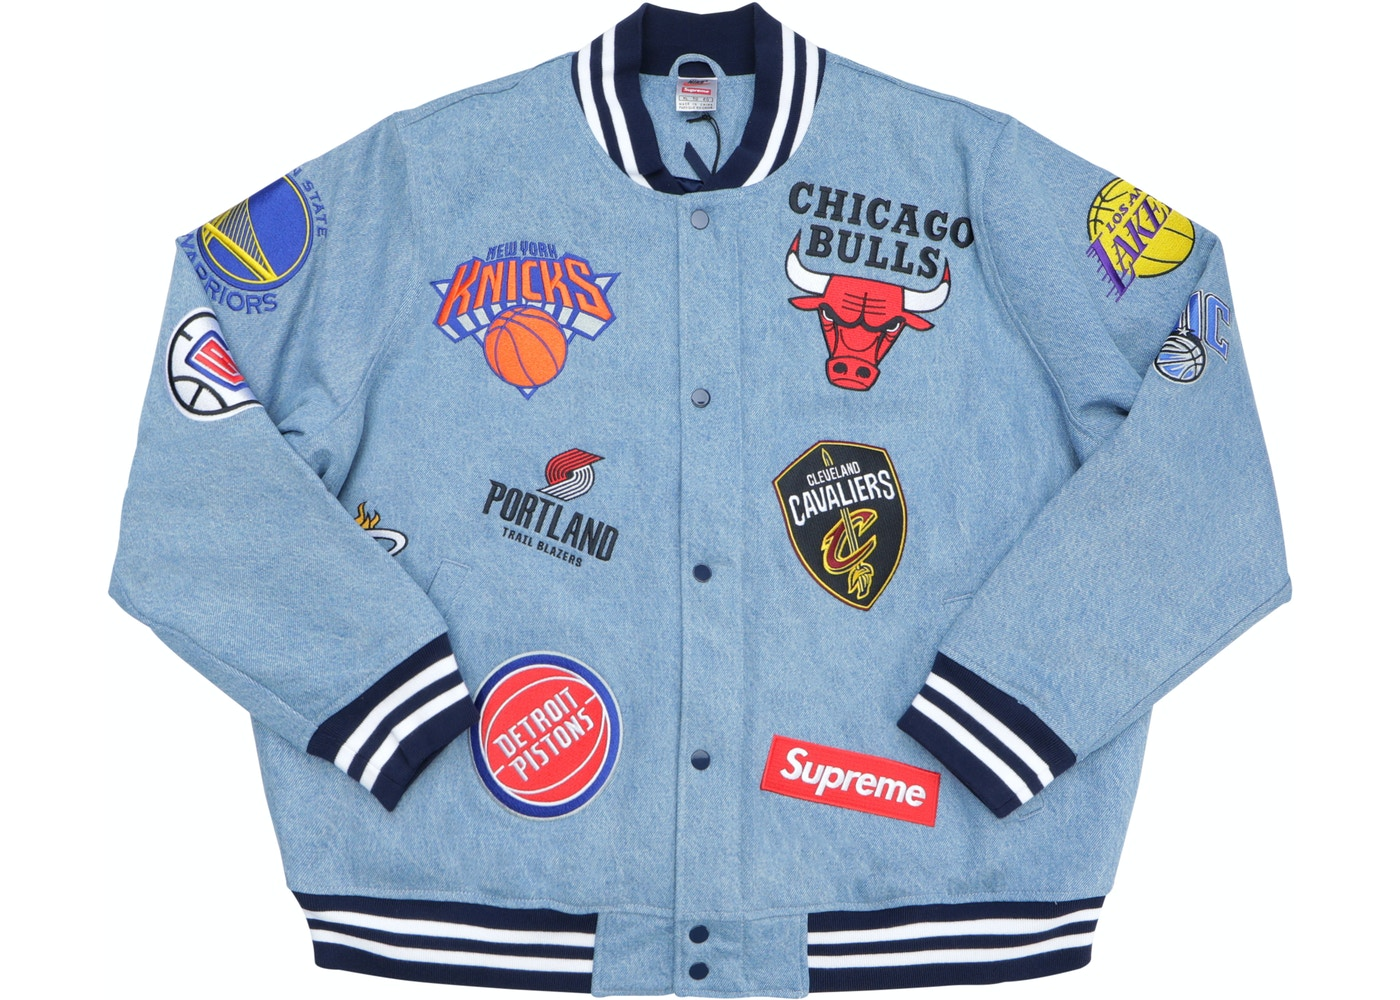 Tareas del hogar lunes Detector  Supreme Nike/NBA Teams Warm-Up Jacket Denim - SS18